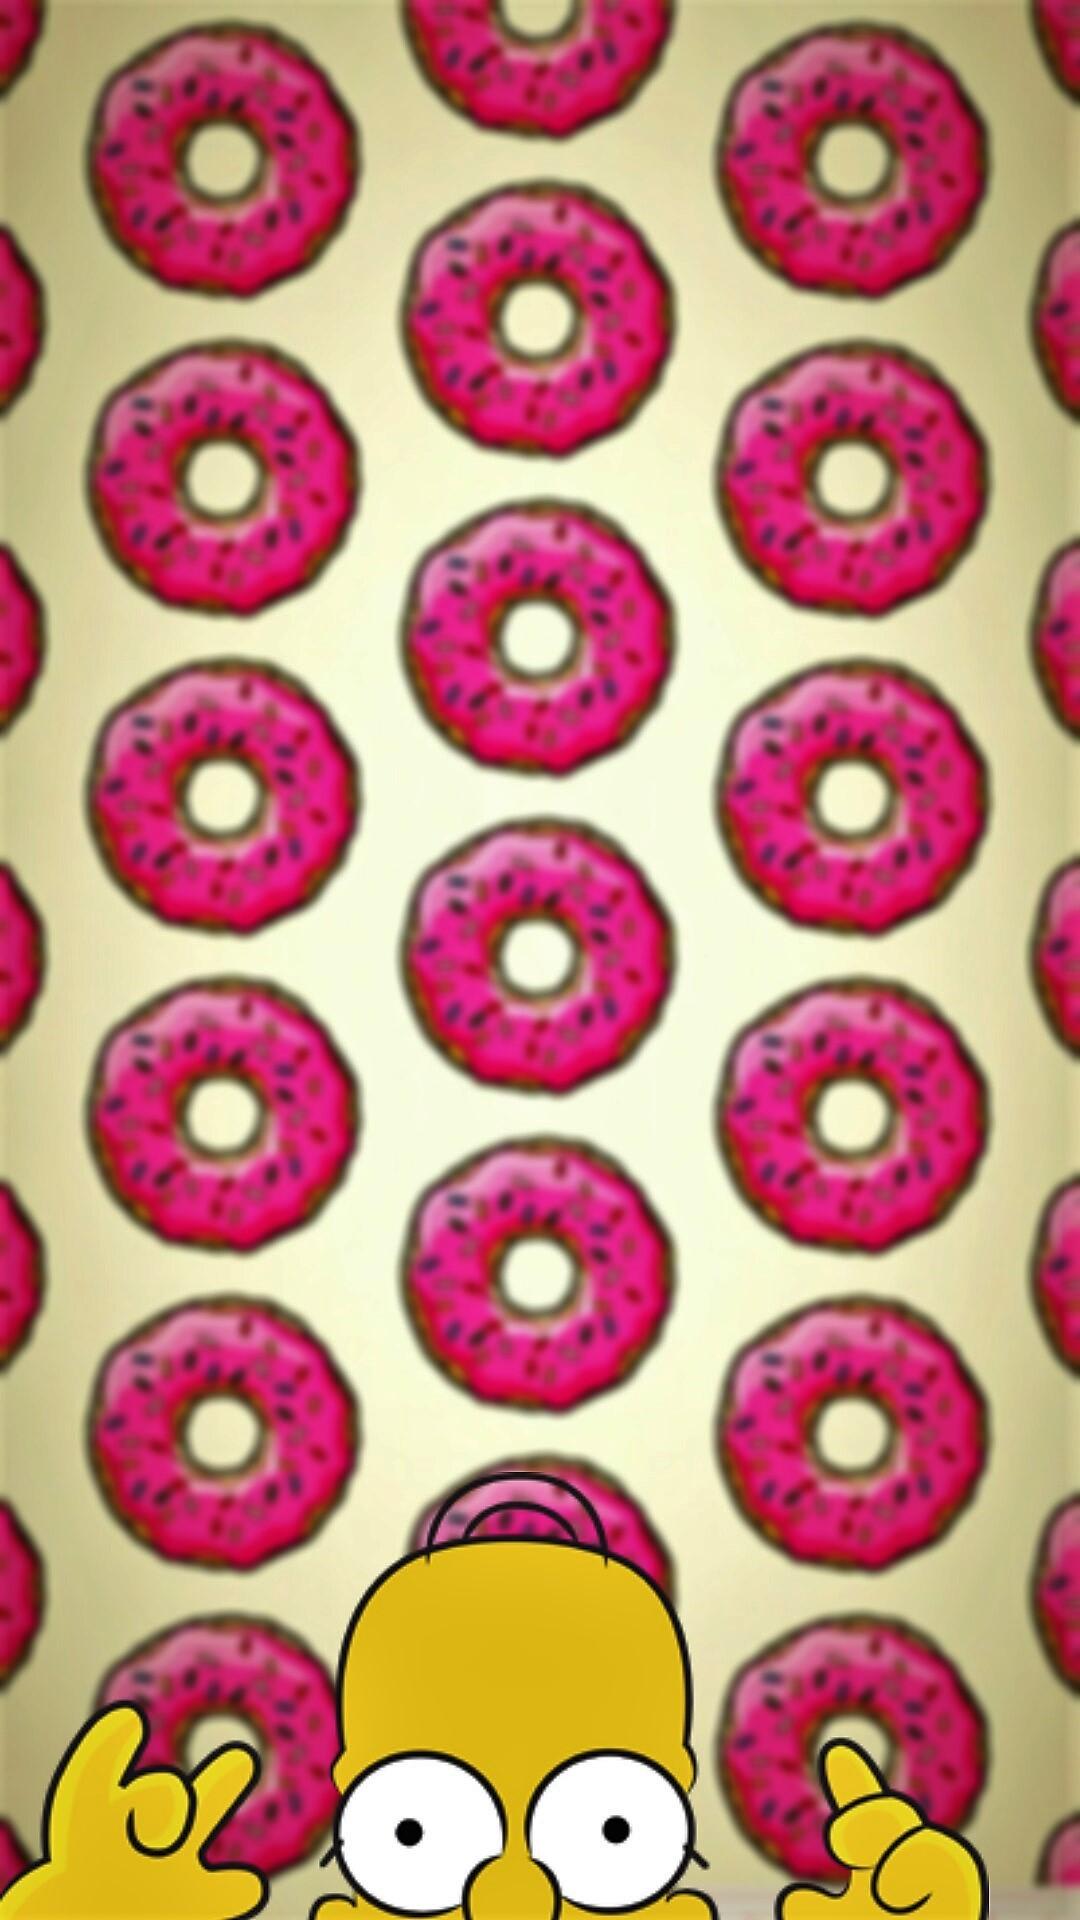 Golf Wang Wallpaper Iphone Odd Future Donut Wallpaper 57 Images